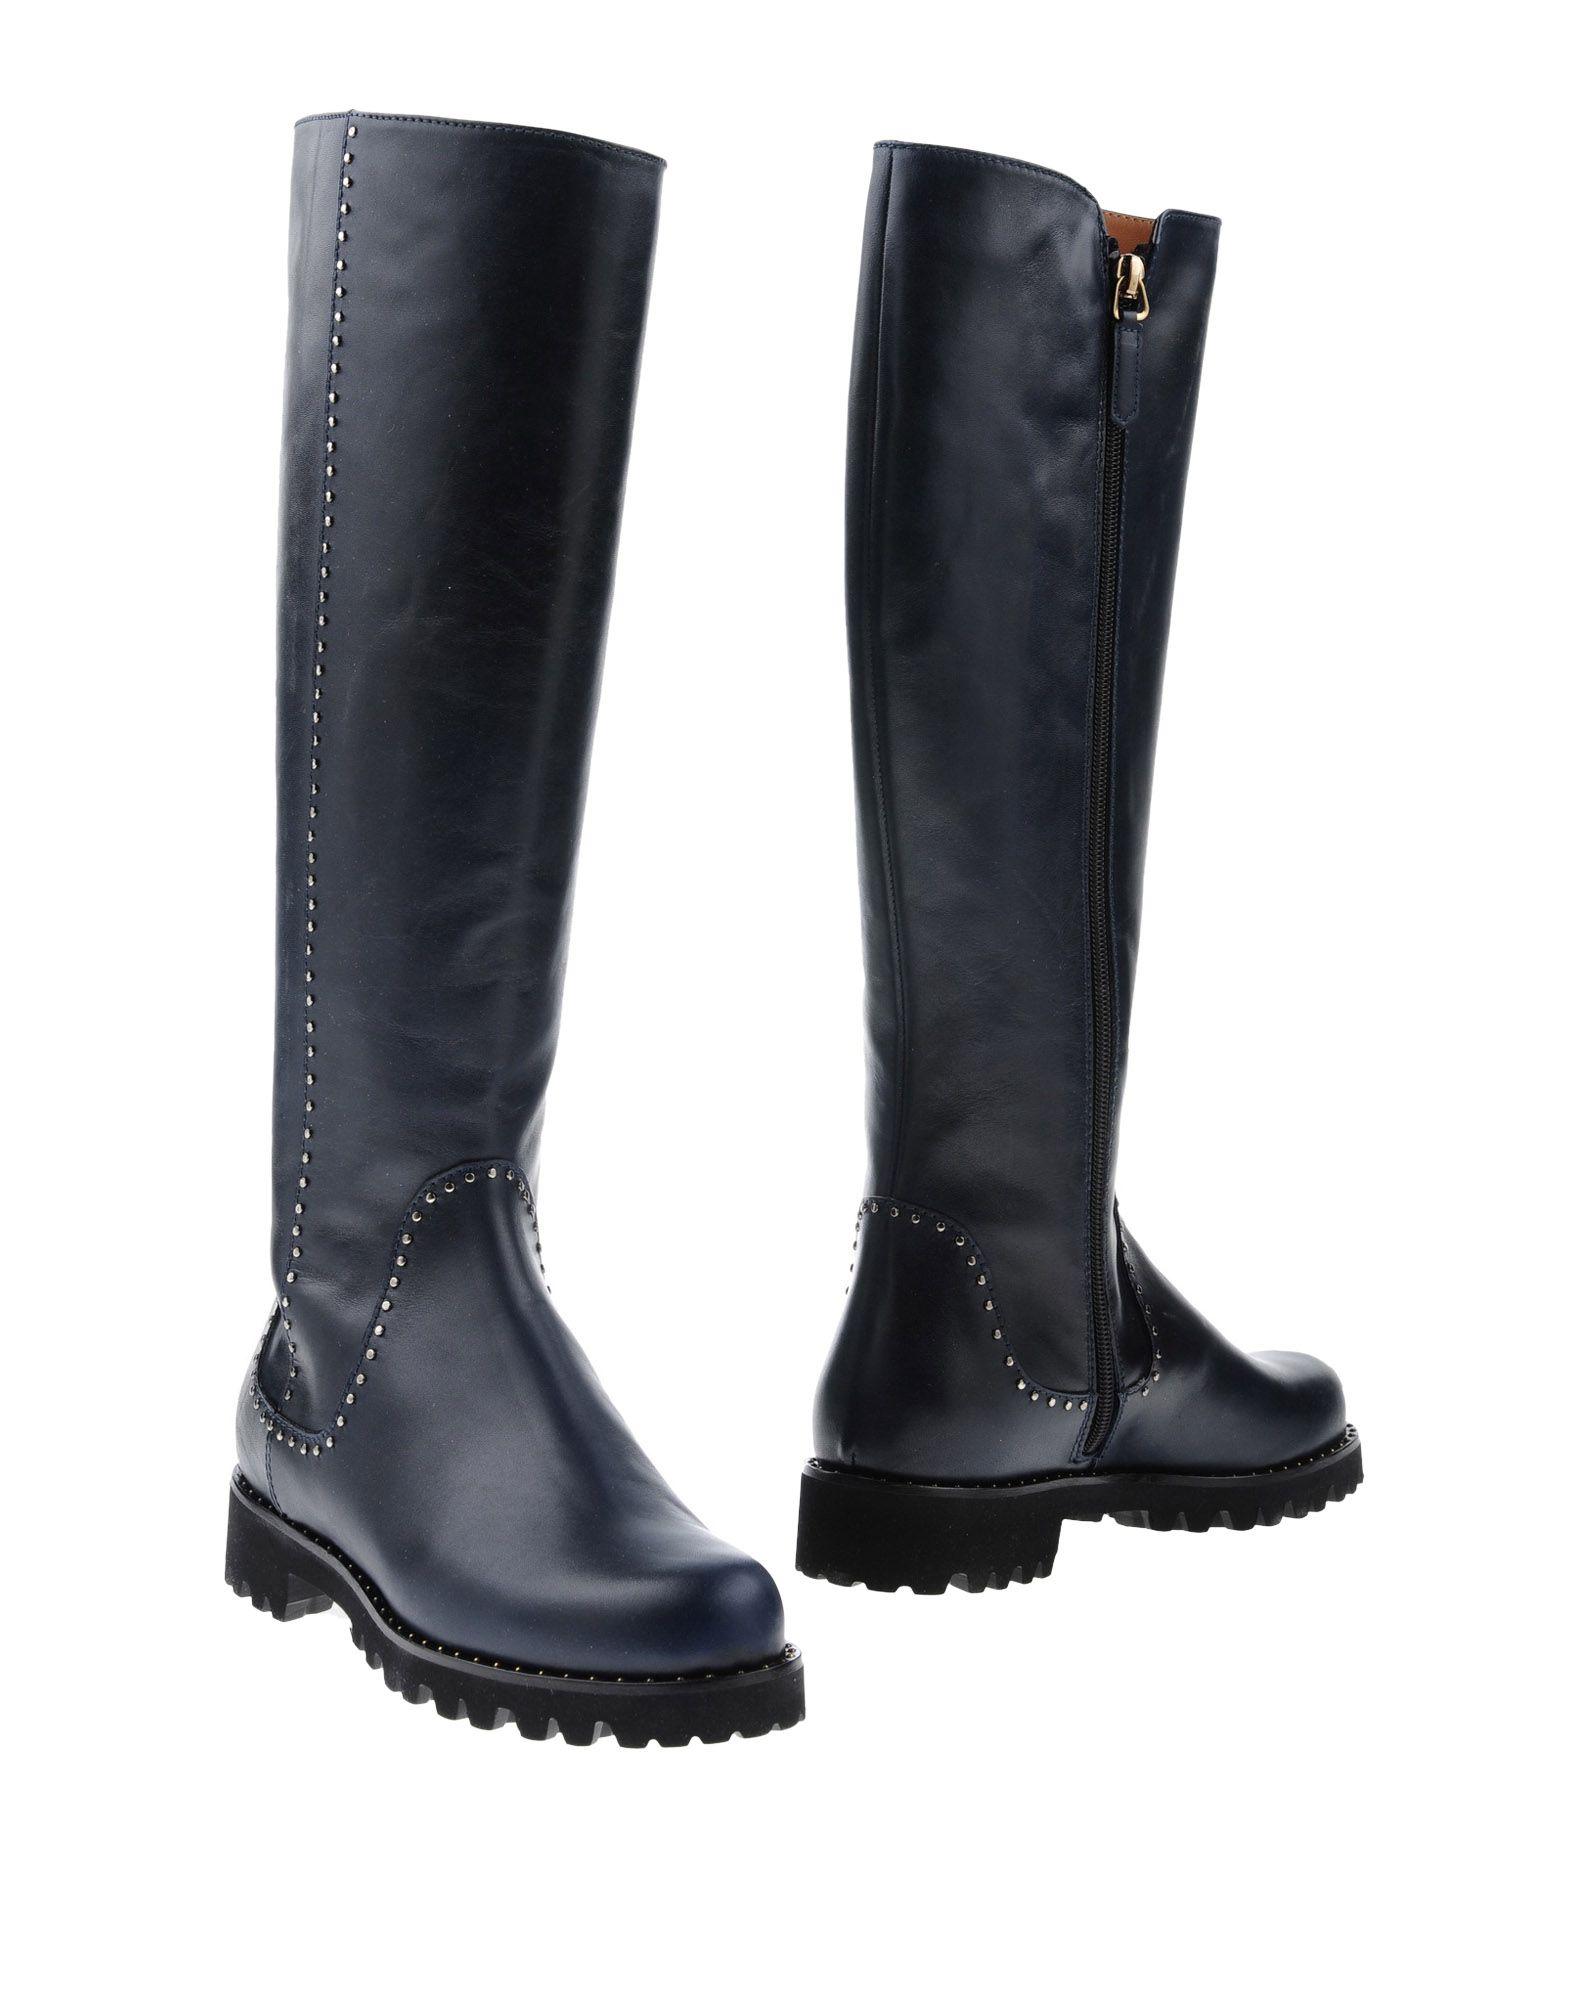 Zamagni Stiefel Damen Heiße  11348293SN Heiße Damen Schuhe 2dc355